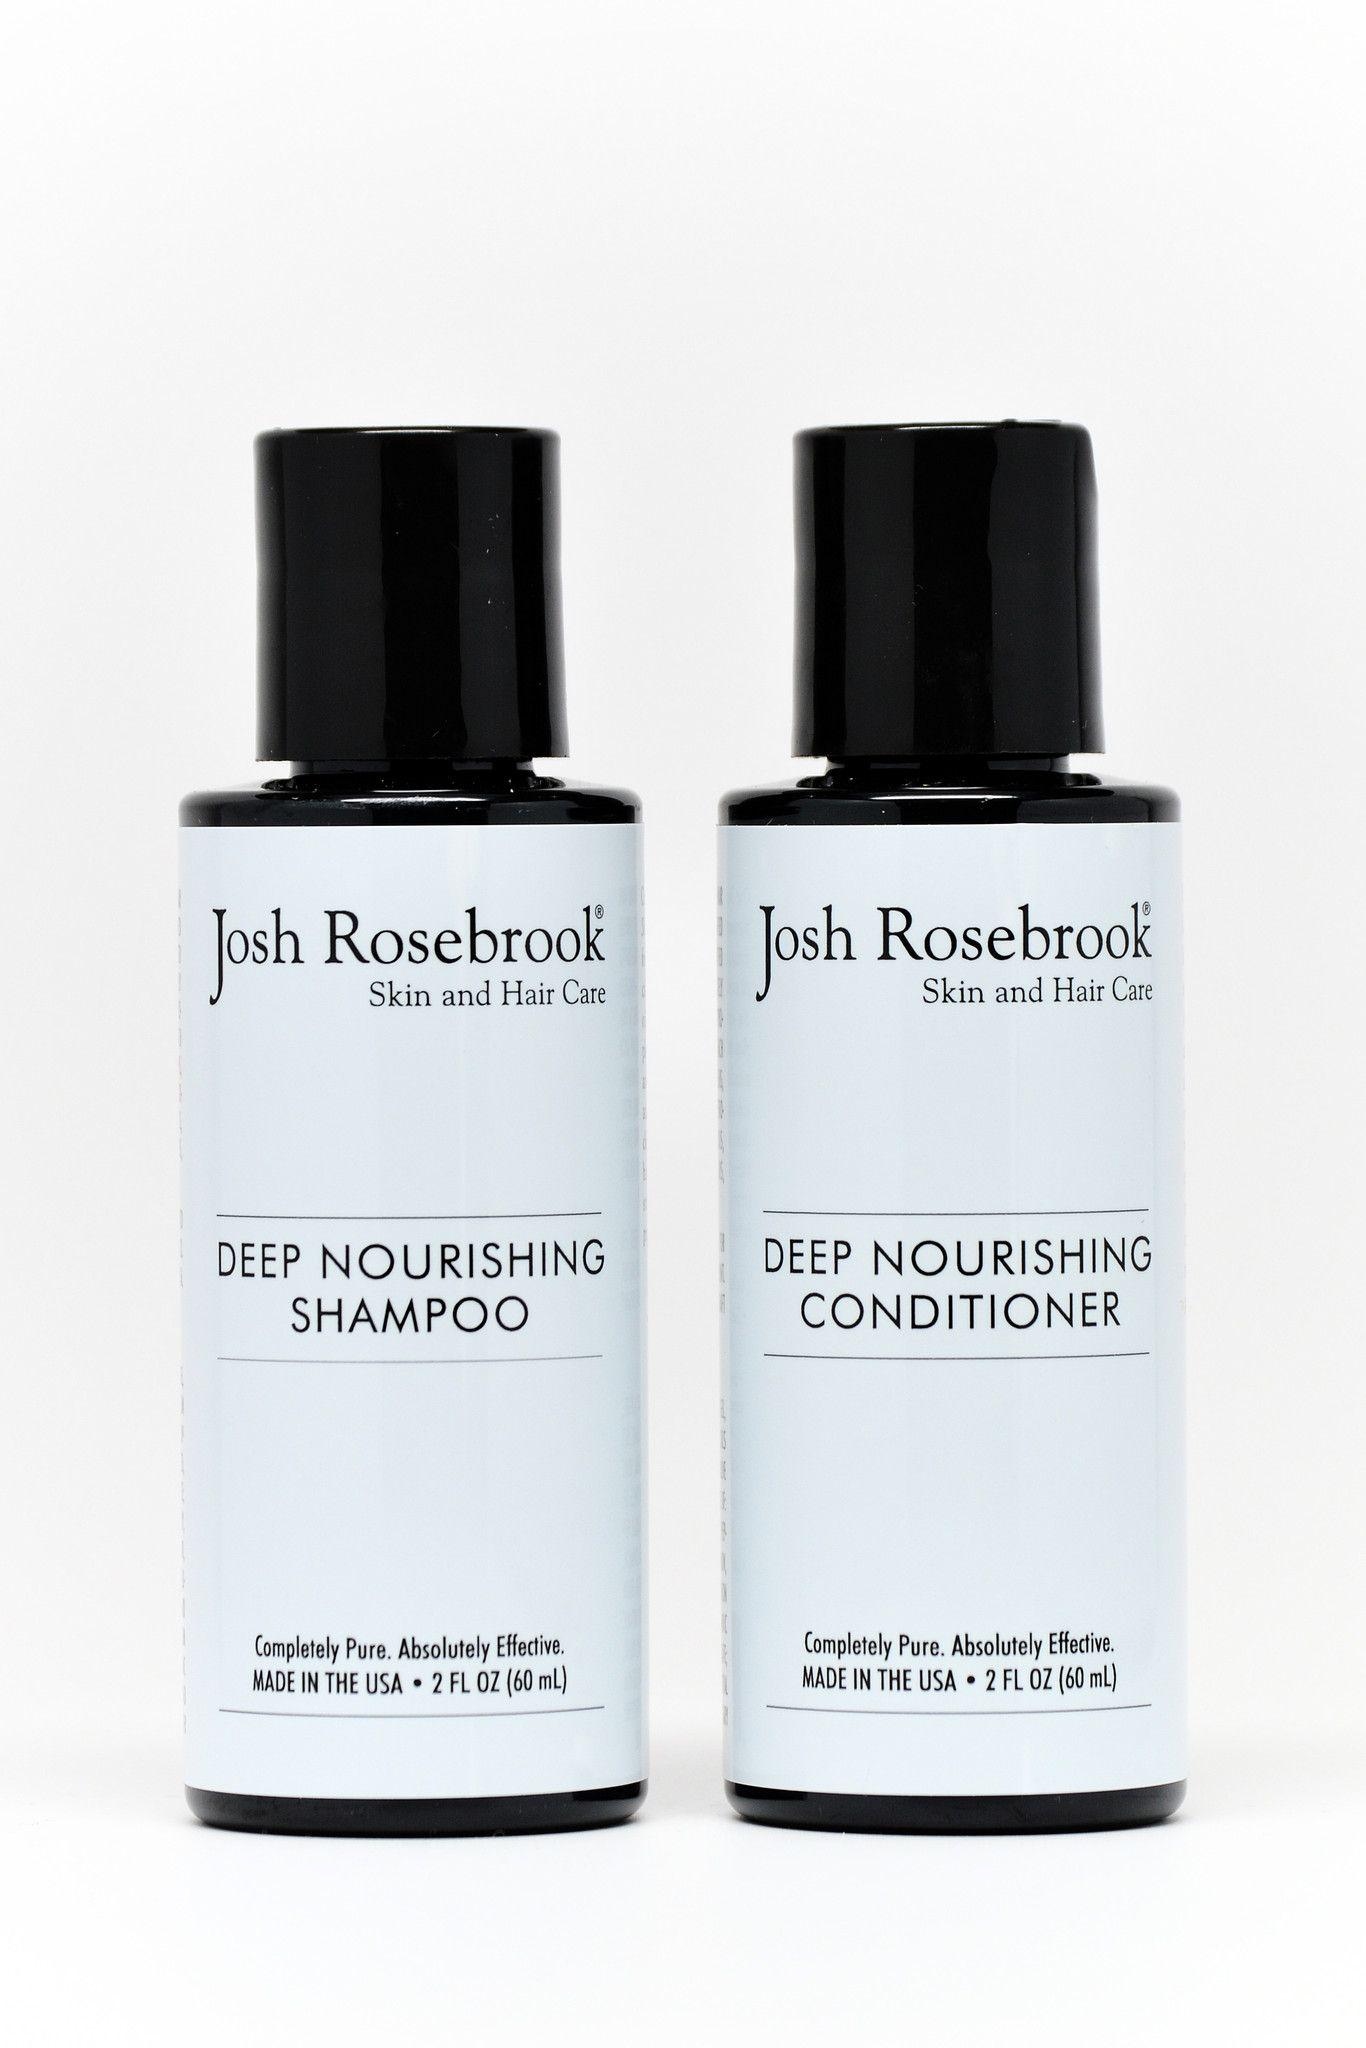 Nourish Hair Care Travellers Hair care, Natural shampoo